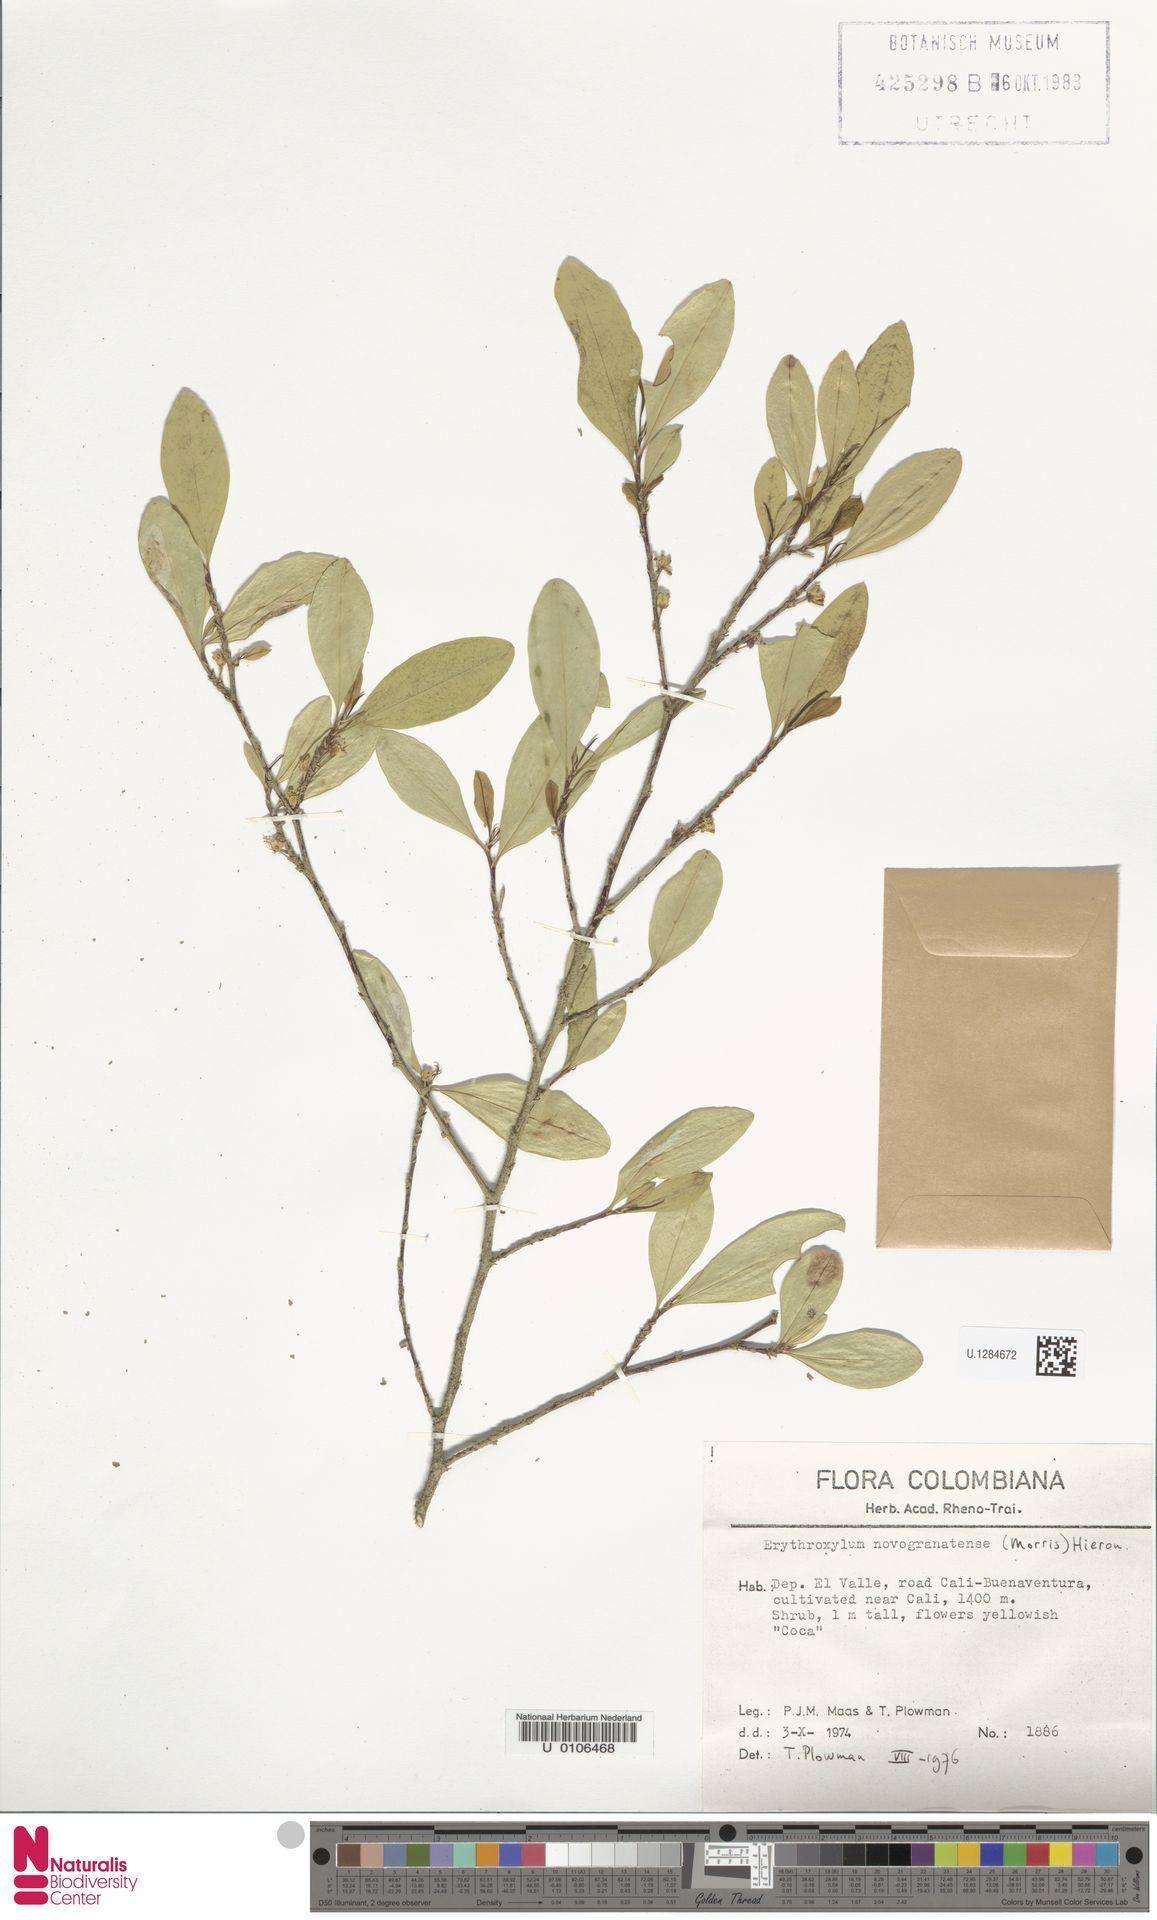 U.1284672 | Erythroxylum novogranatense (Morris) Hieron.